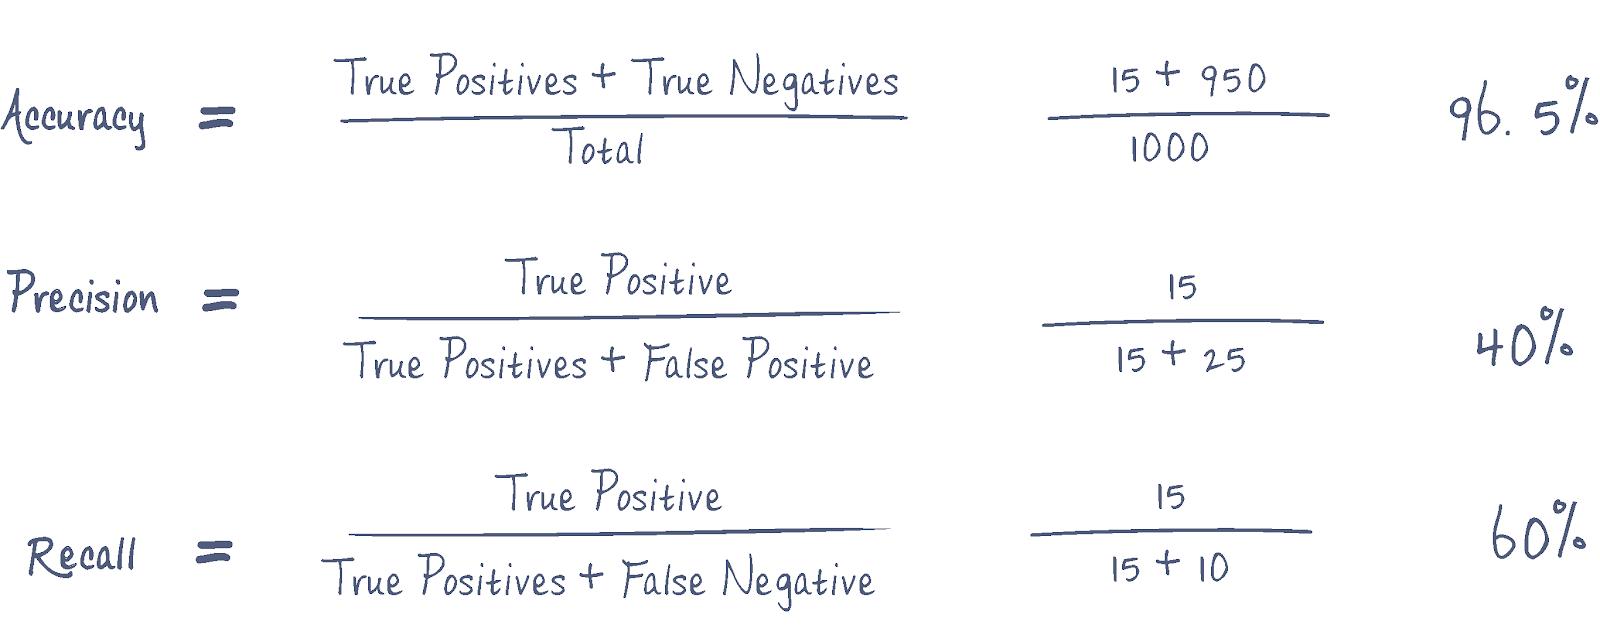 confusion matrix applied to secrets detection